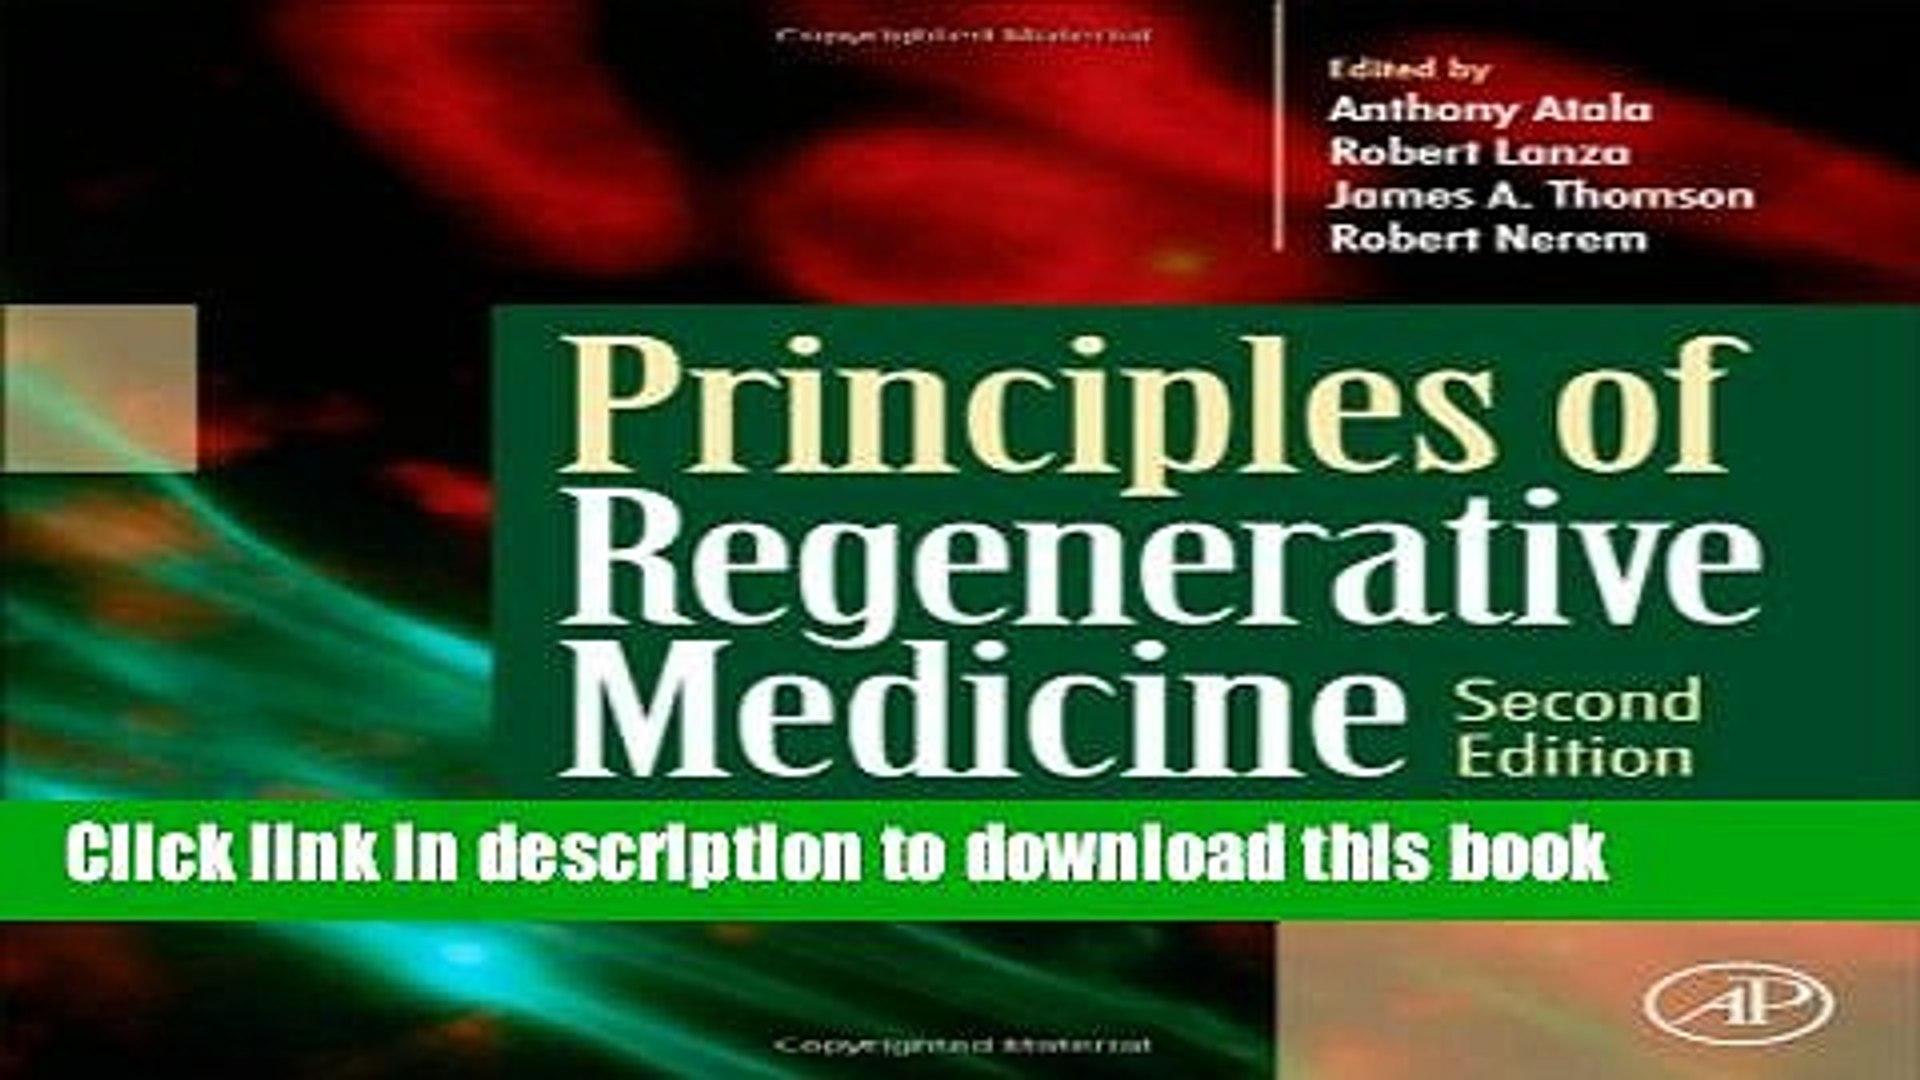 Principles of Regenerative Medicine, Second Edition